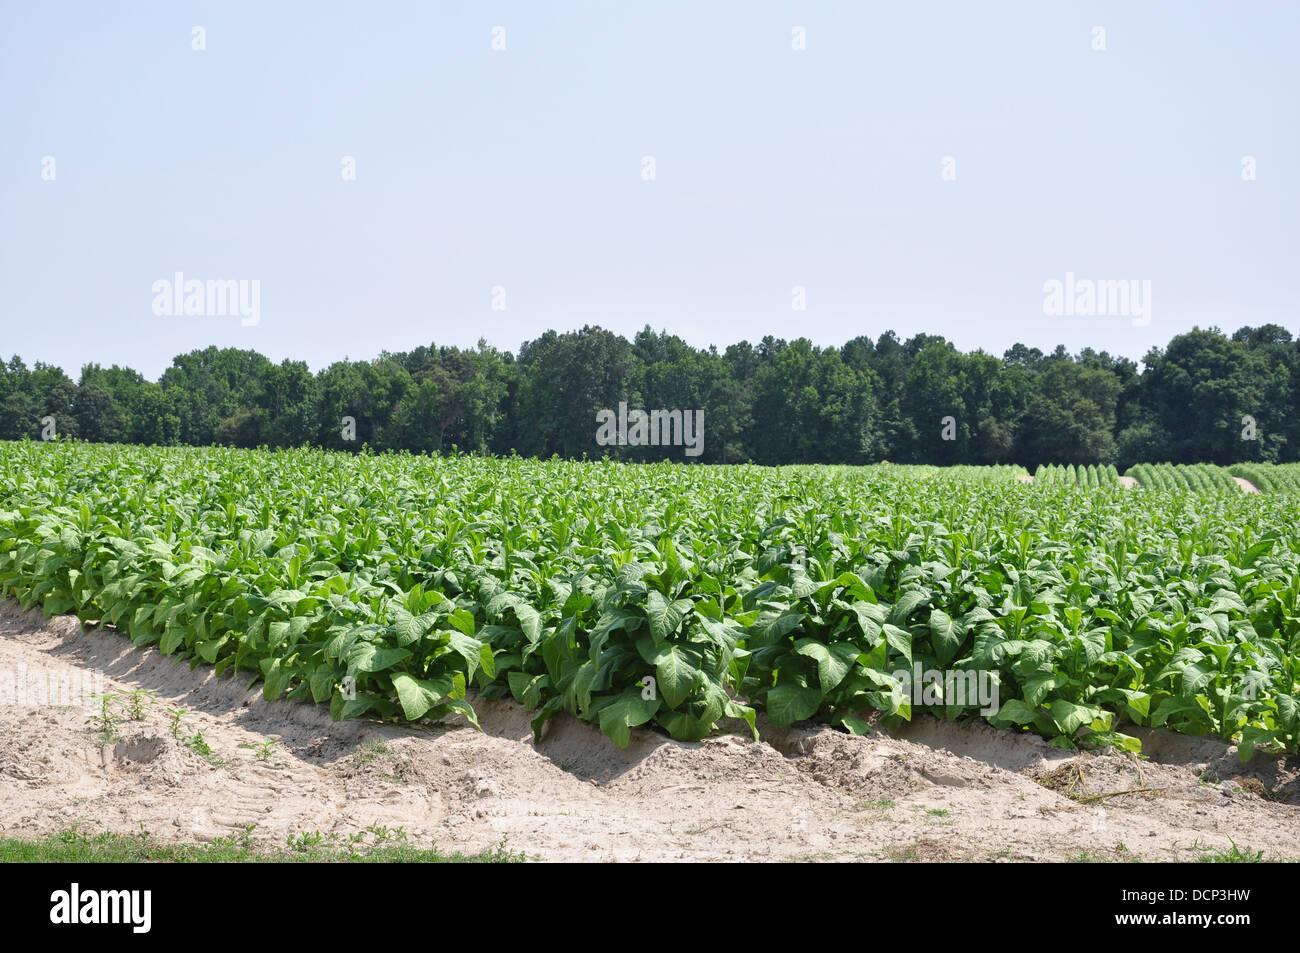 Tobacco Field - Stock Image